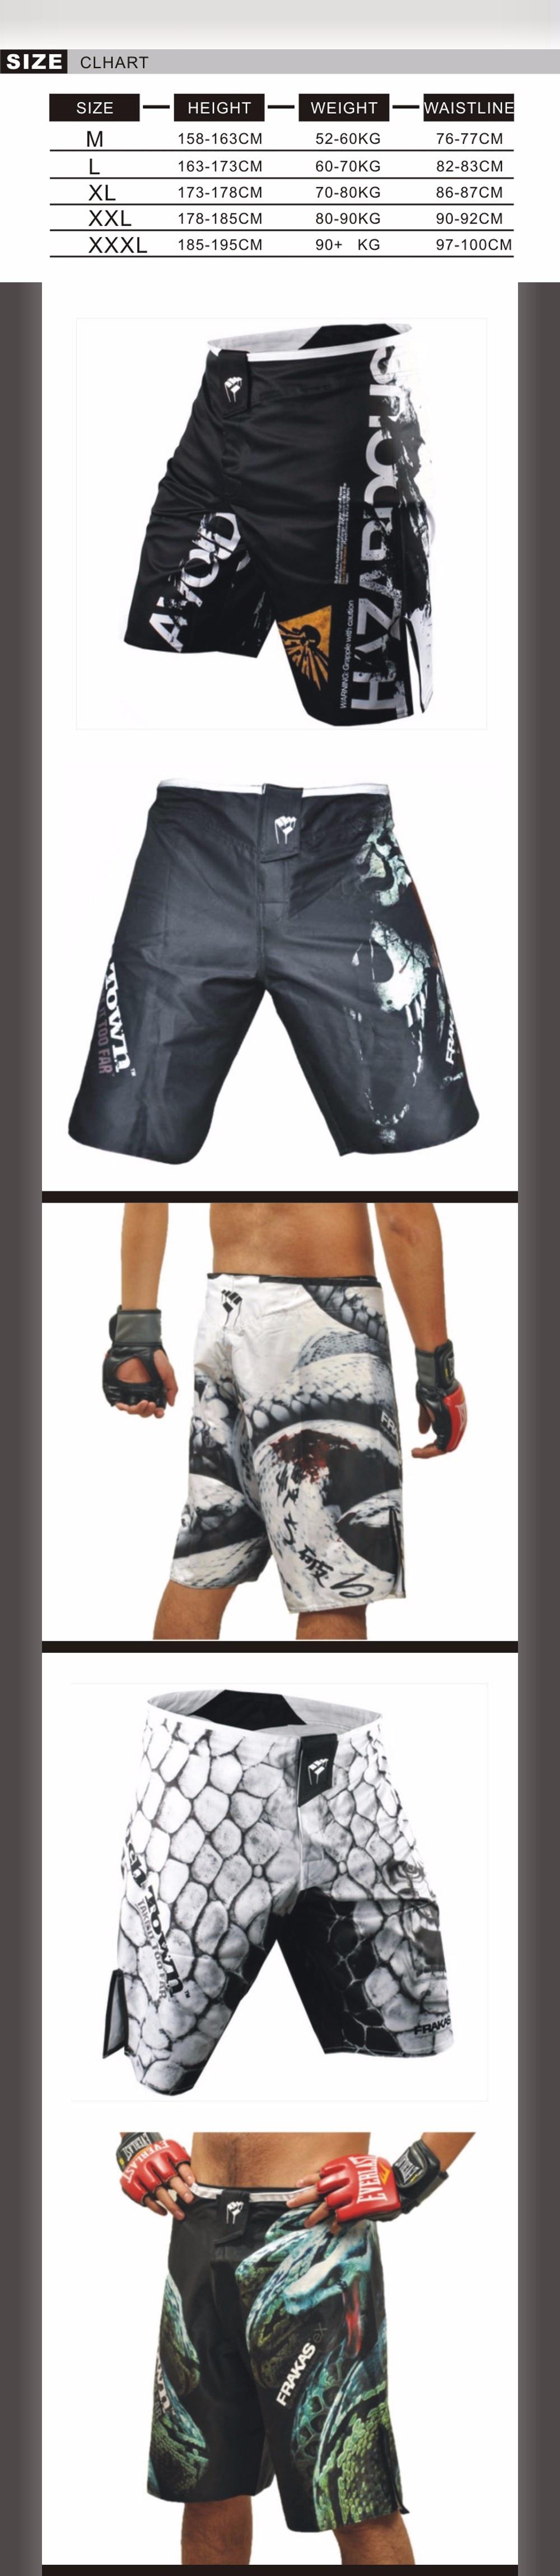 Sotf Mens Japanese Warrior Sports Fitness Angle Pants Tiger Muay Thai Boxing Shorts Mma Short Kickboxing Boxeo Pretorian Refreshment Sports & Entertainment